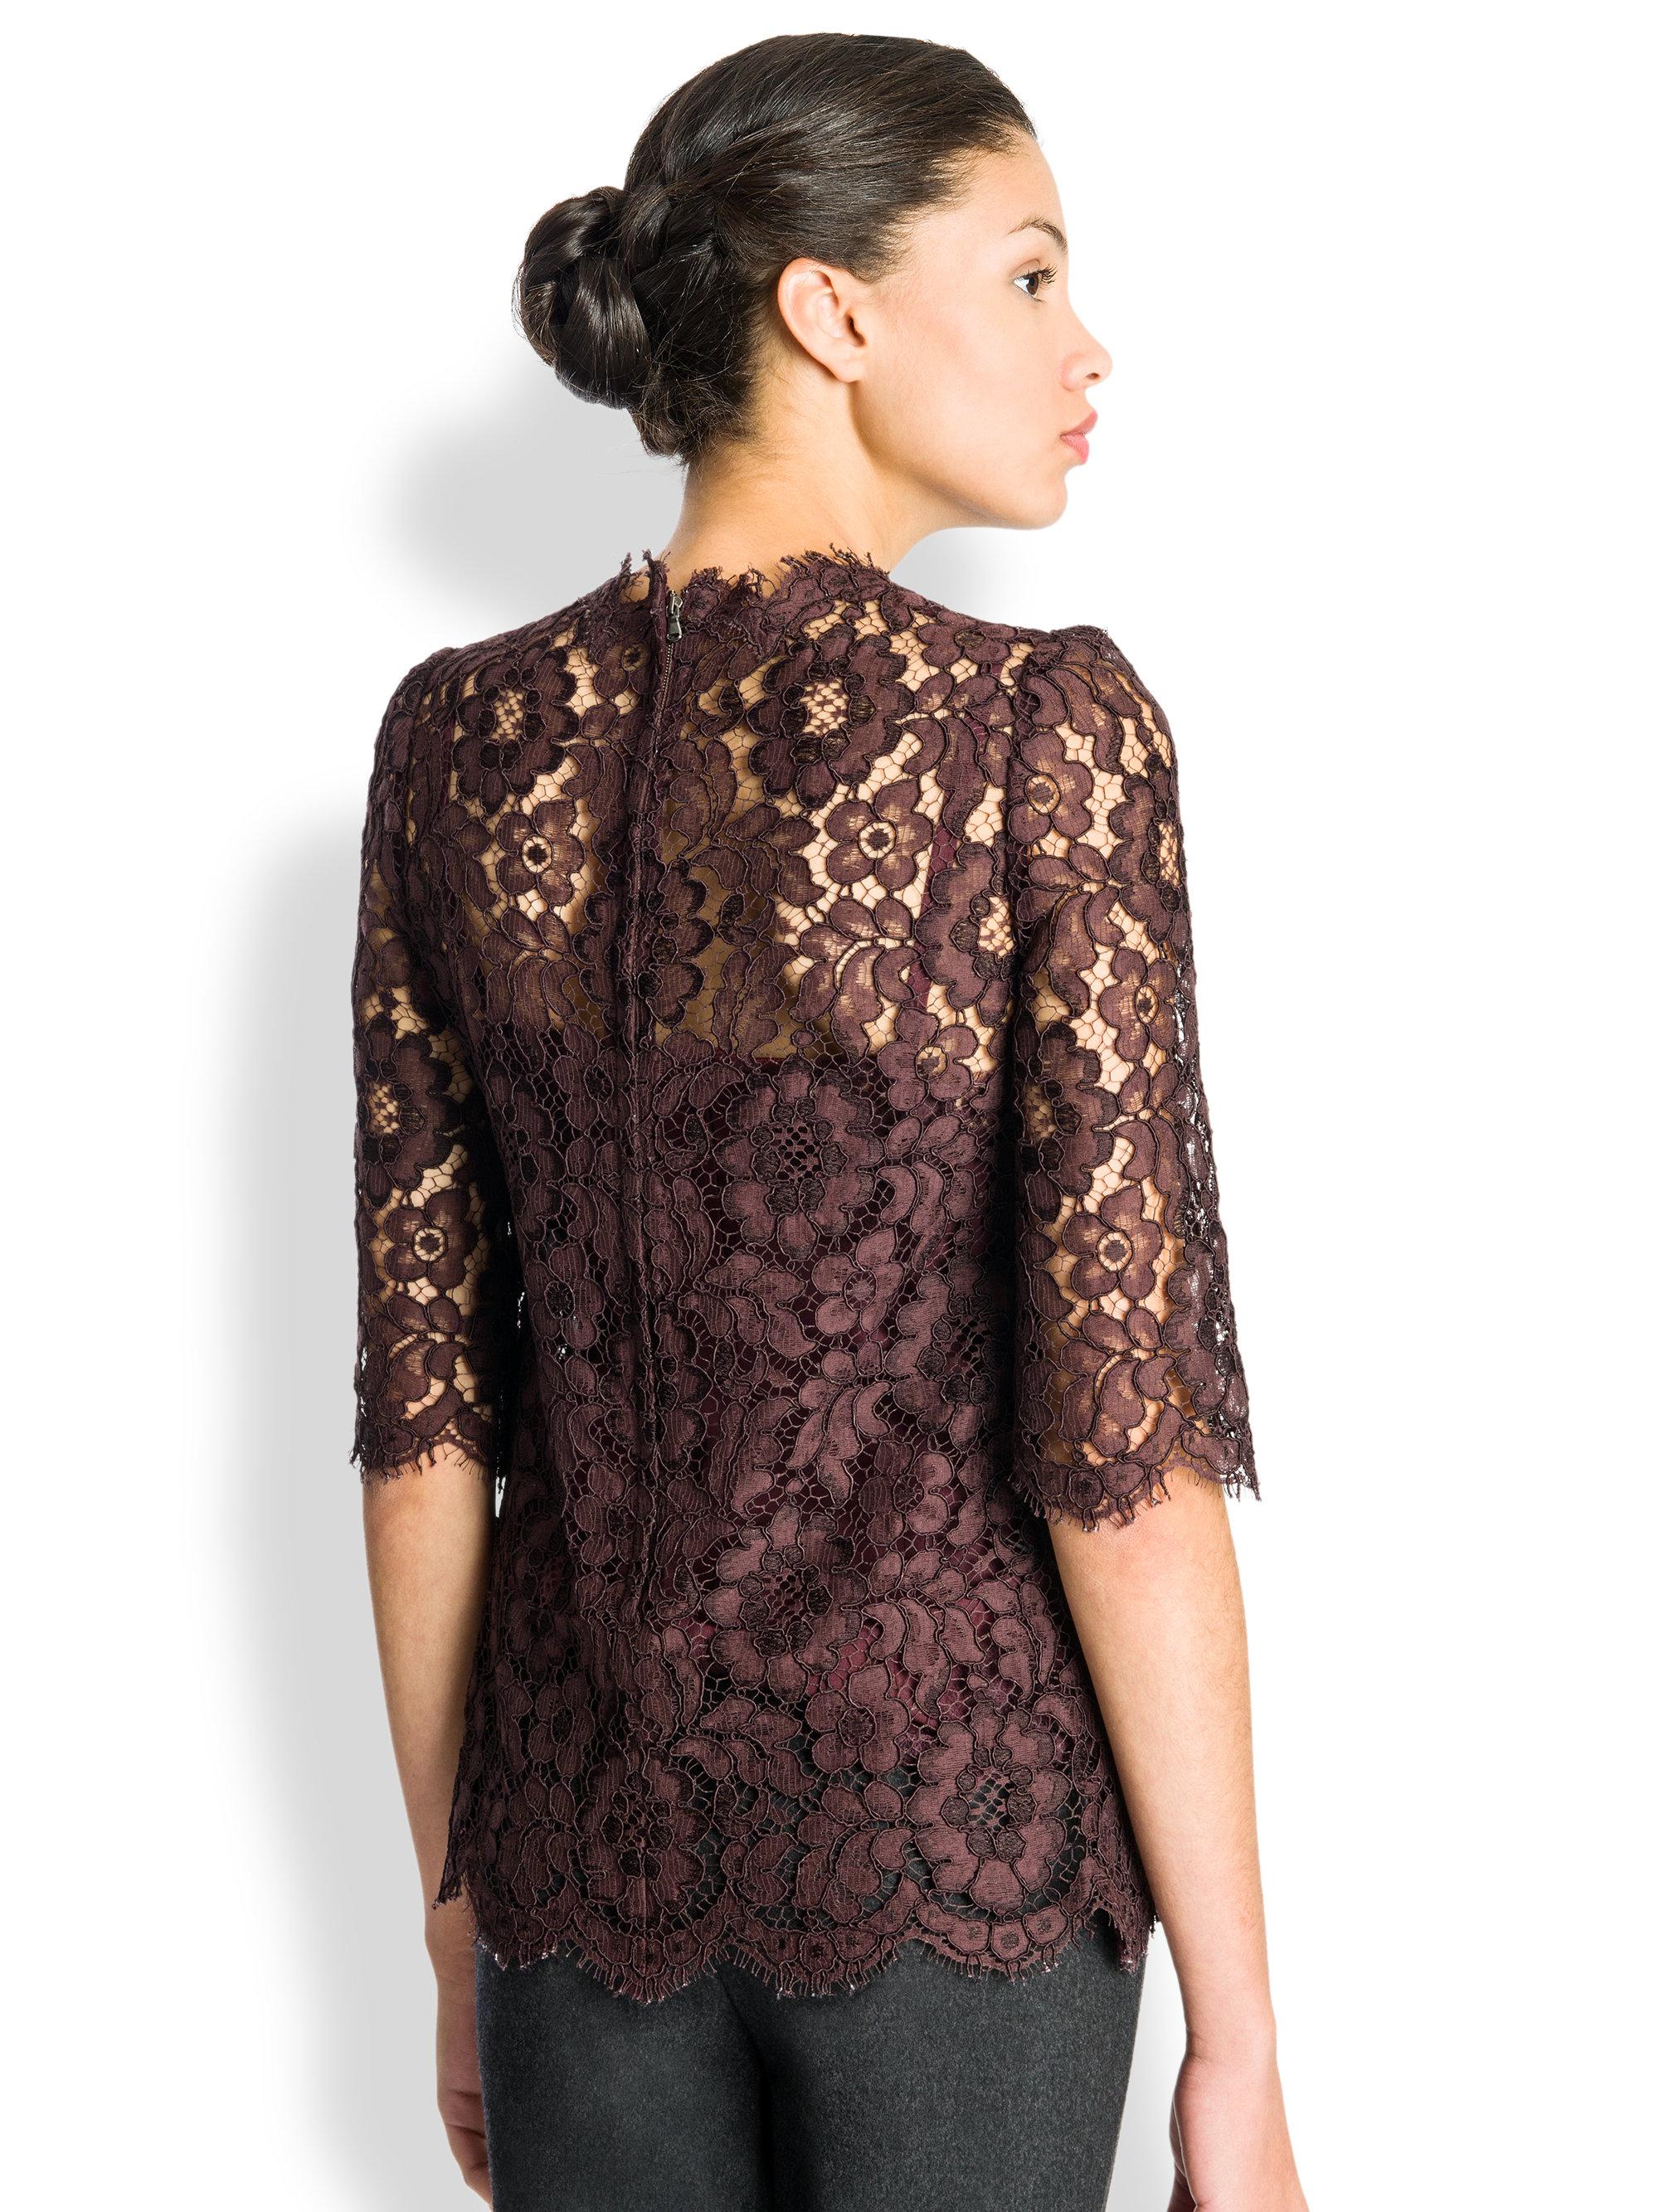 Long Sleeve Black Lace Blouse